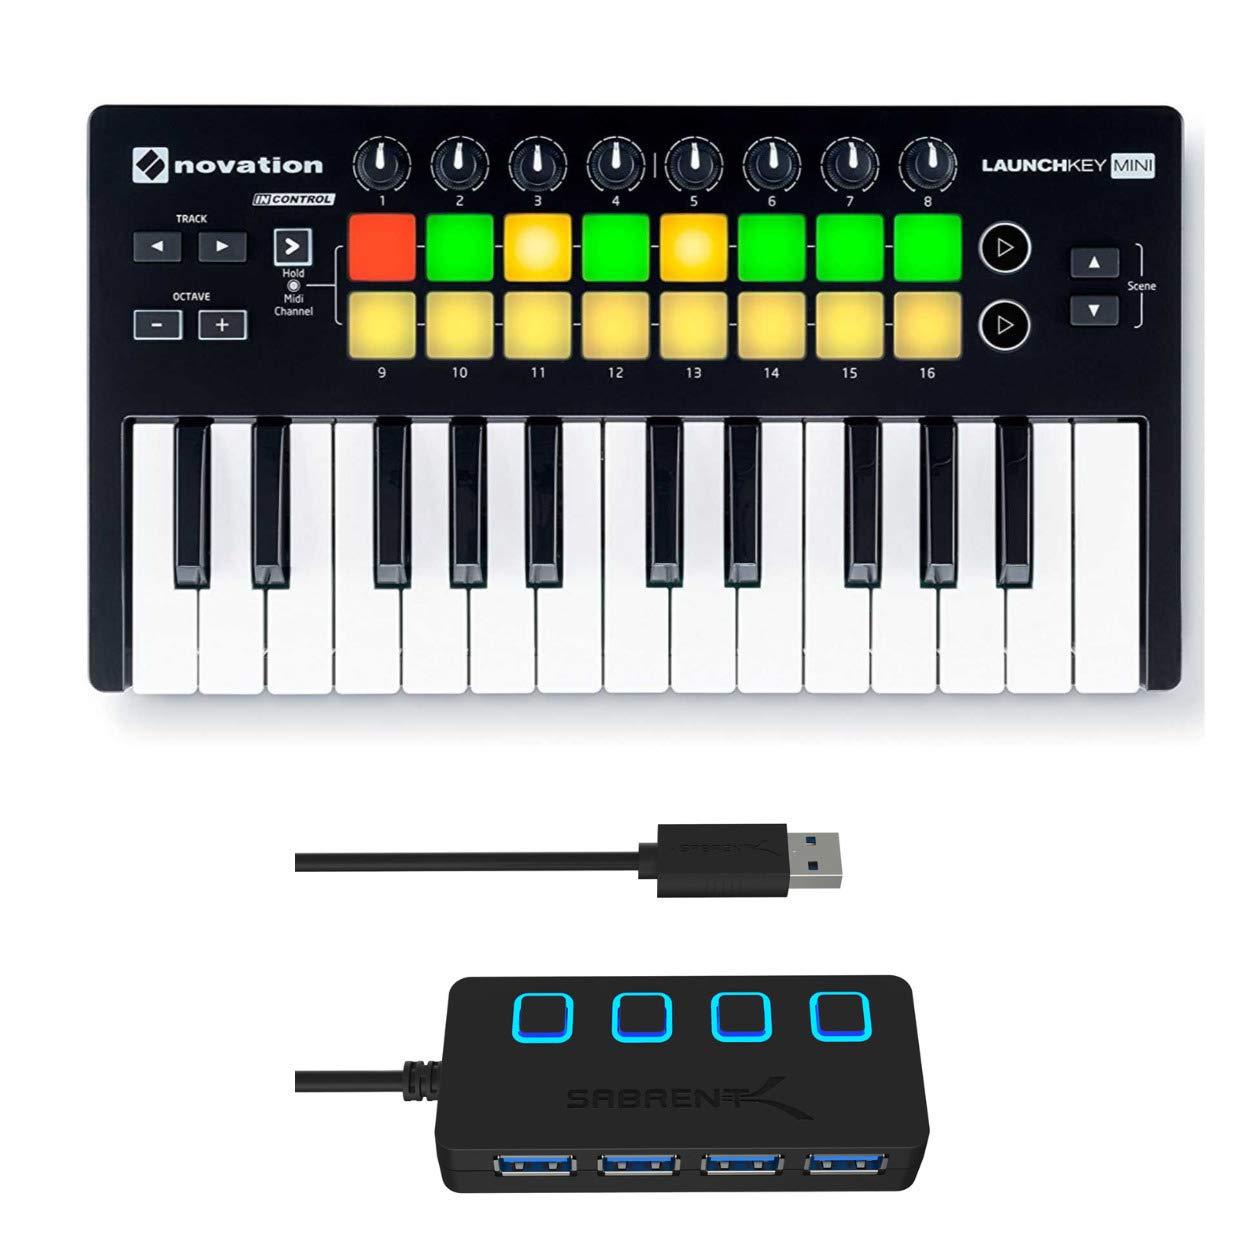 Novation Launchkey Mini 25-Note MK2 USB Keyboard Controller with 4-Port 3.0 USB HUB by Novation